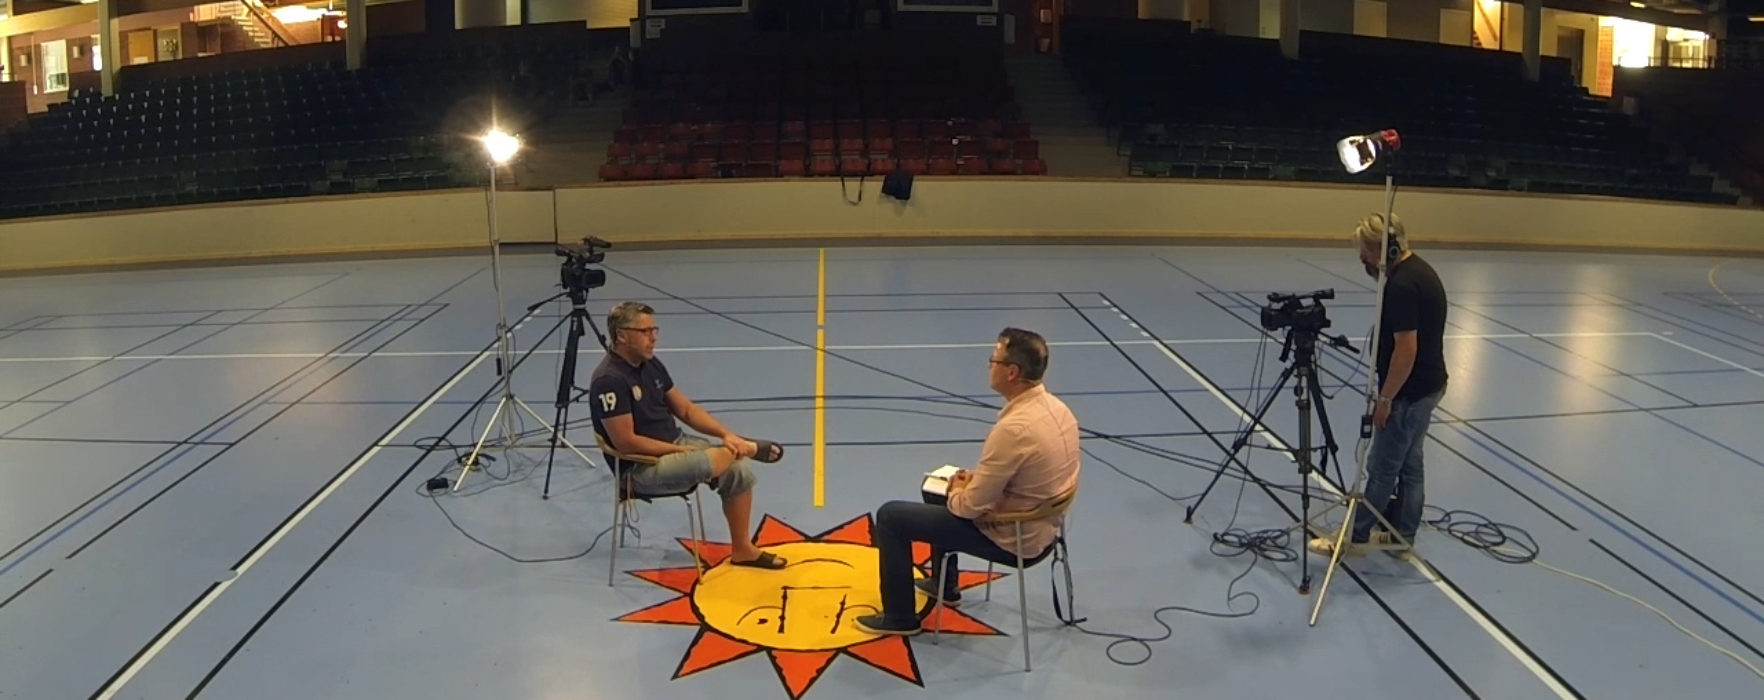 Glimt Sport – Ulf Andersson, IF Hellton